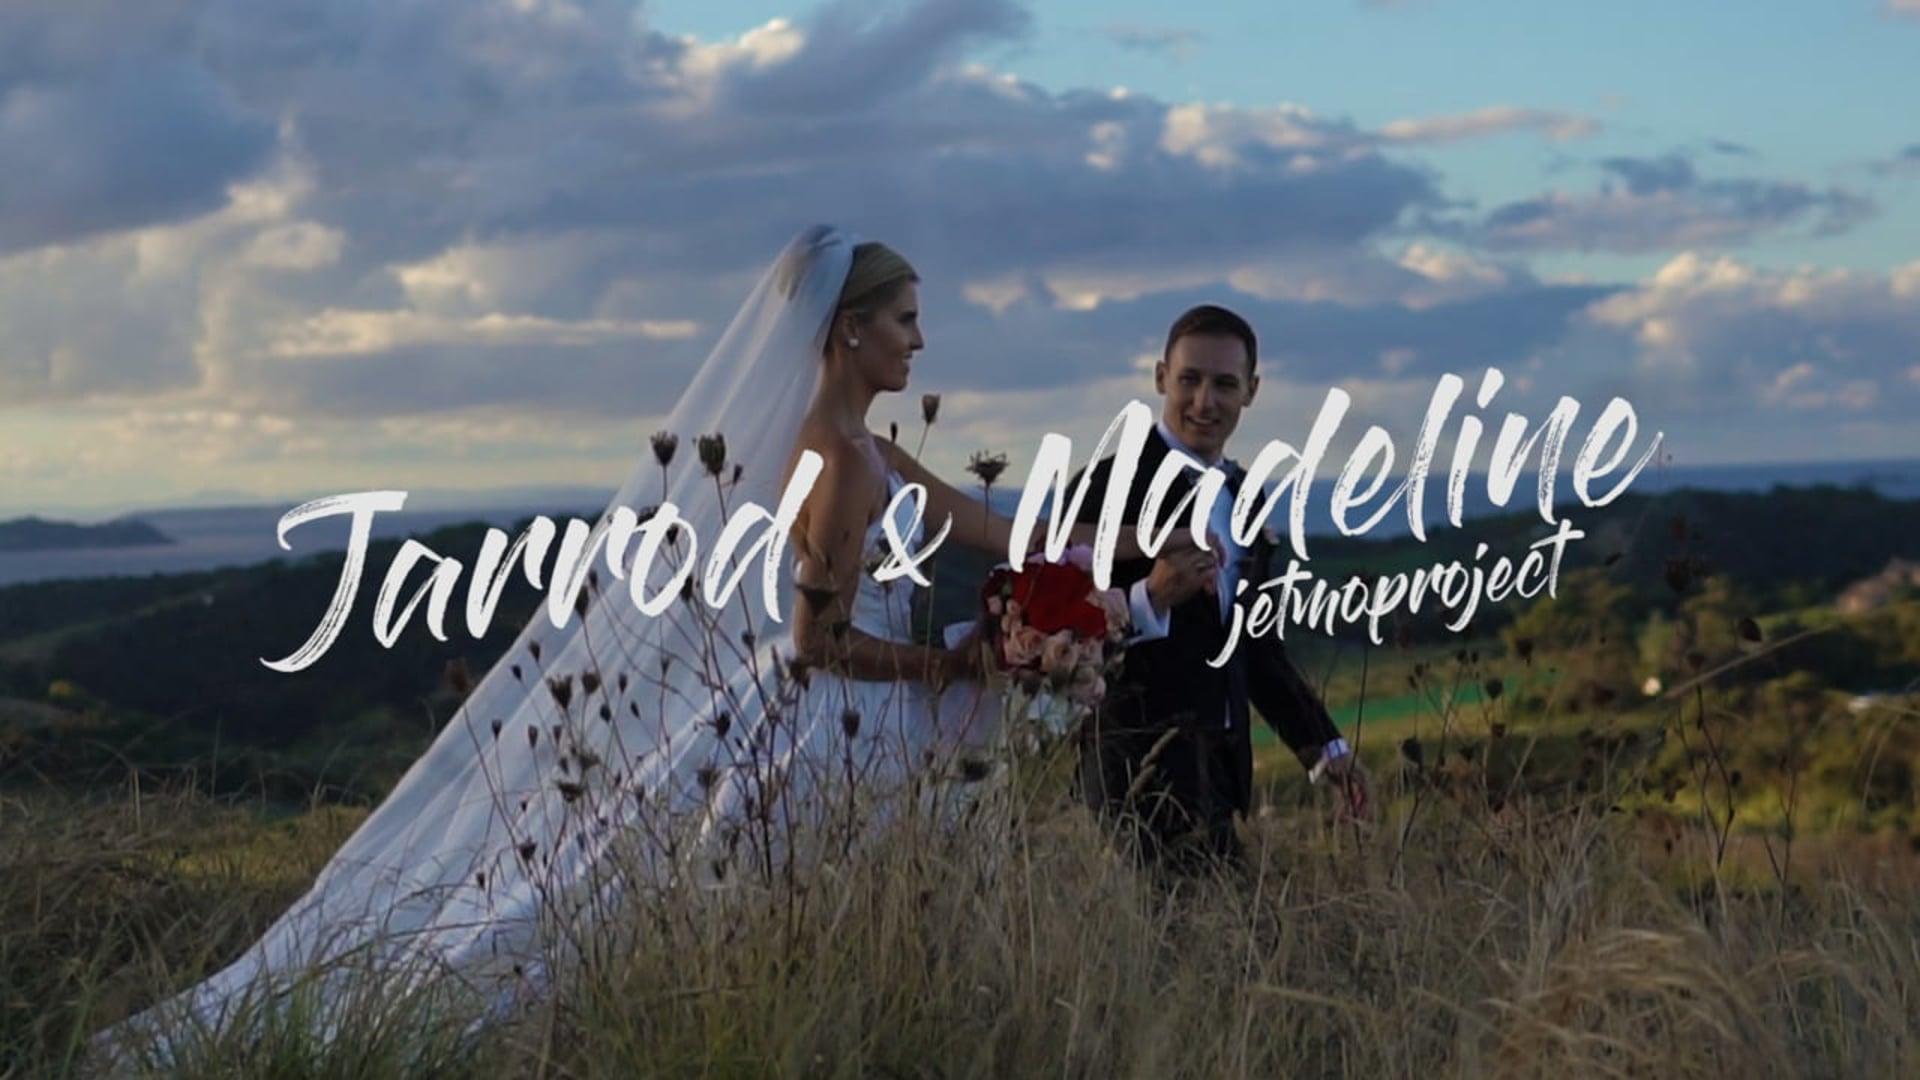 Jarrod & Madeline